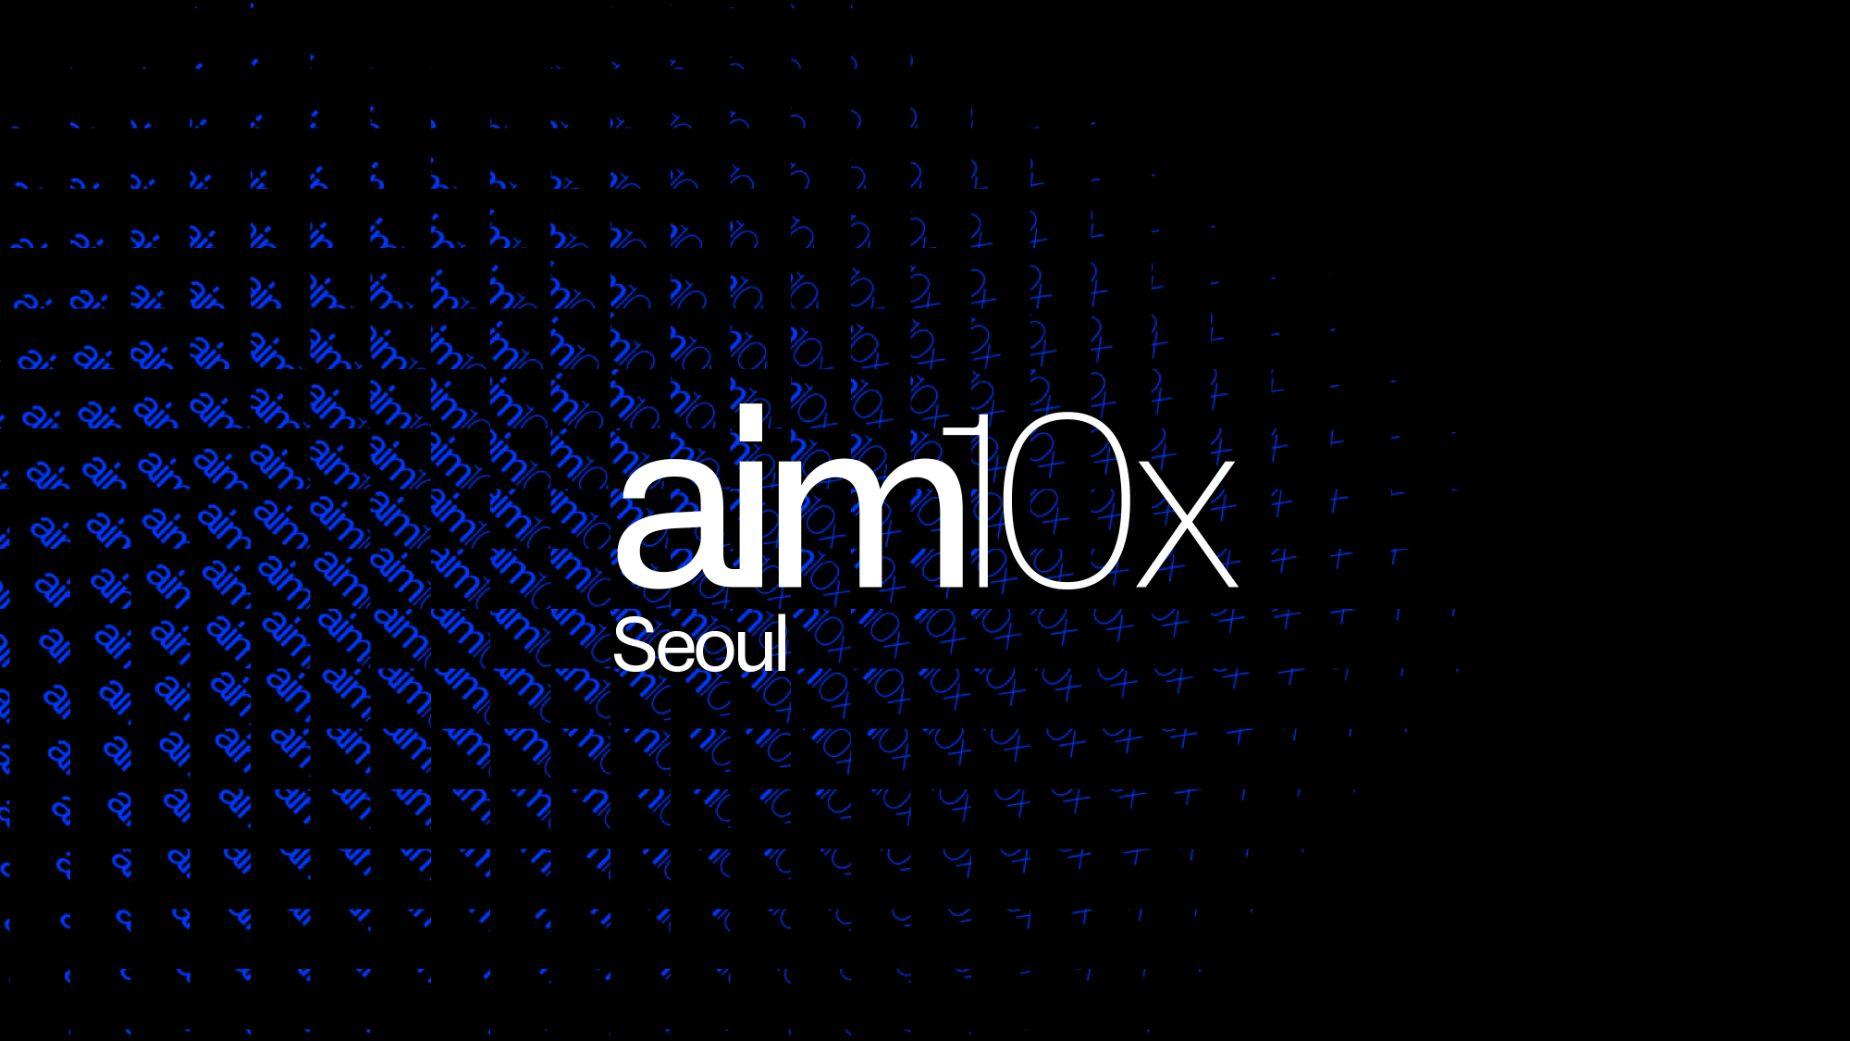 aim10x event in Seoul, Korea